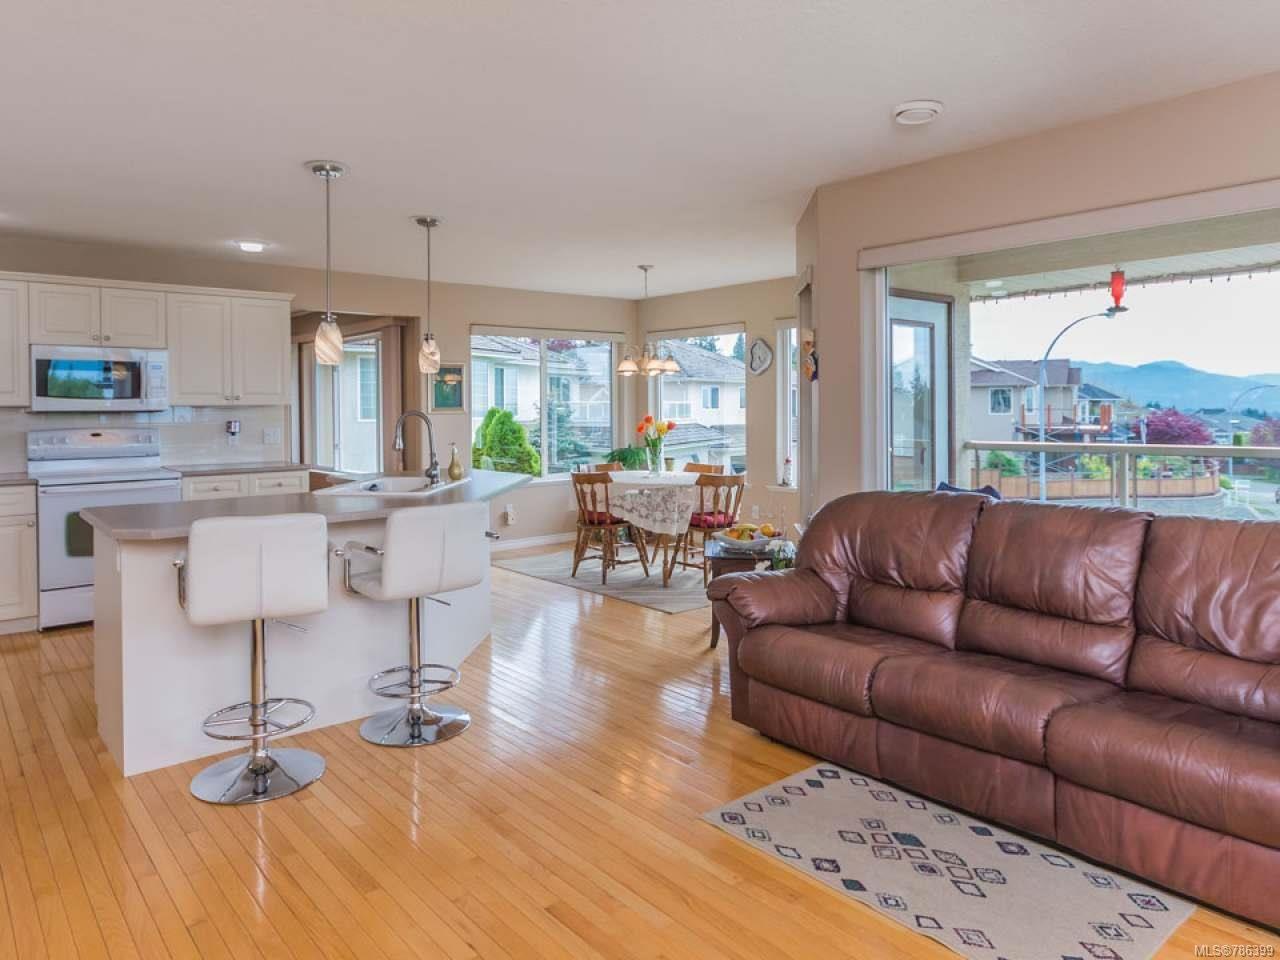 Photo 9: Photos: 5371 HIGHRIDGE PLACE in NANAIMO: Na North Nanaimo House for sale (Nanaimo)  : MLS®# 786399